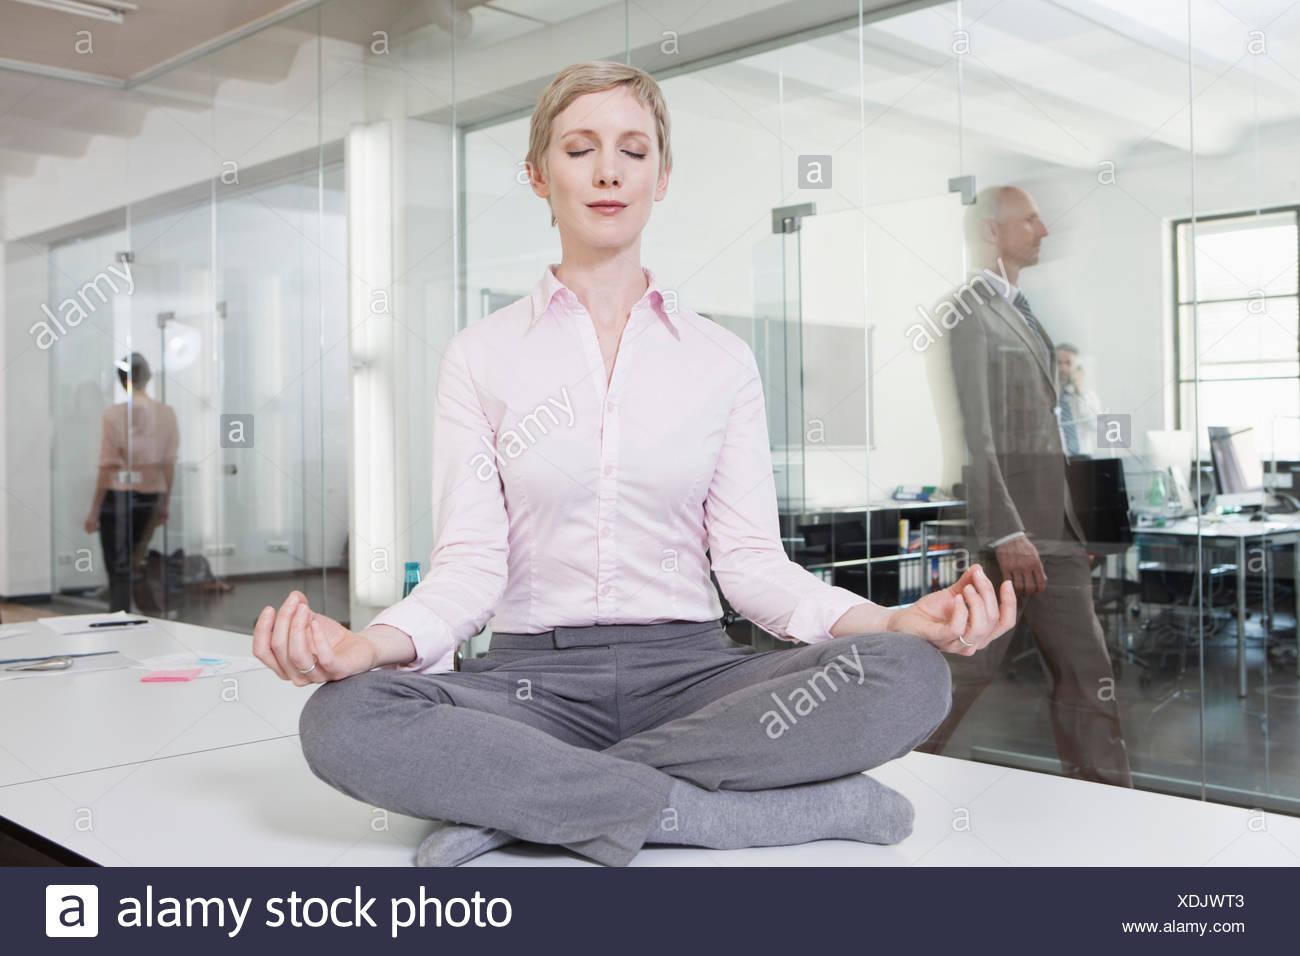 meditation office. Germany, Munich, Businesswoman In Office, Meditating On Desk - Stock Image Meditation Office L